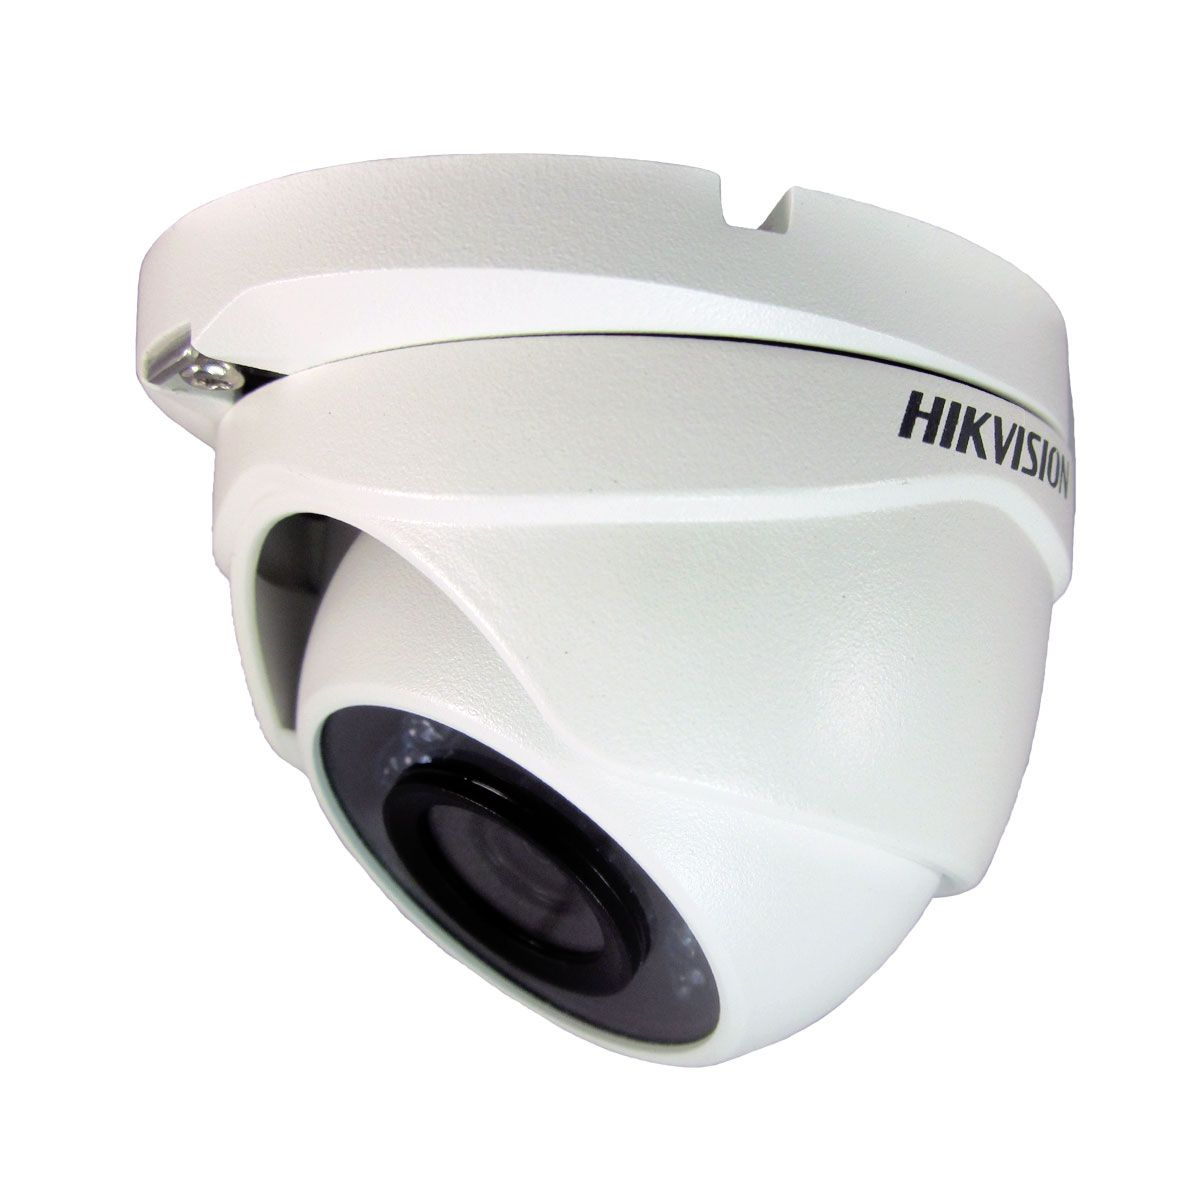 Cámara Hikvision DS-2CE56C0T-IRM 1MP Tipo Domo